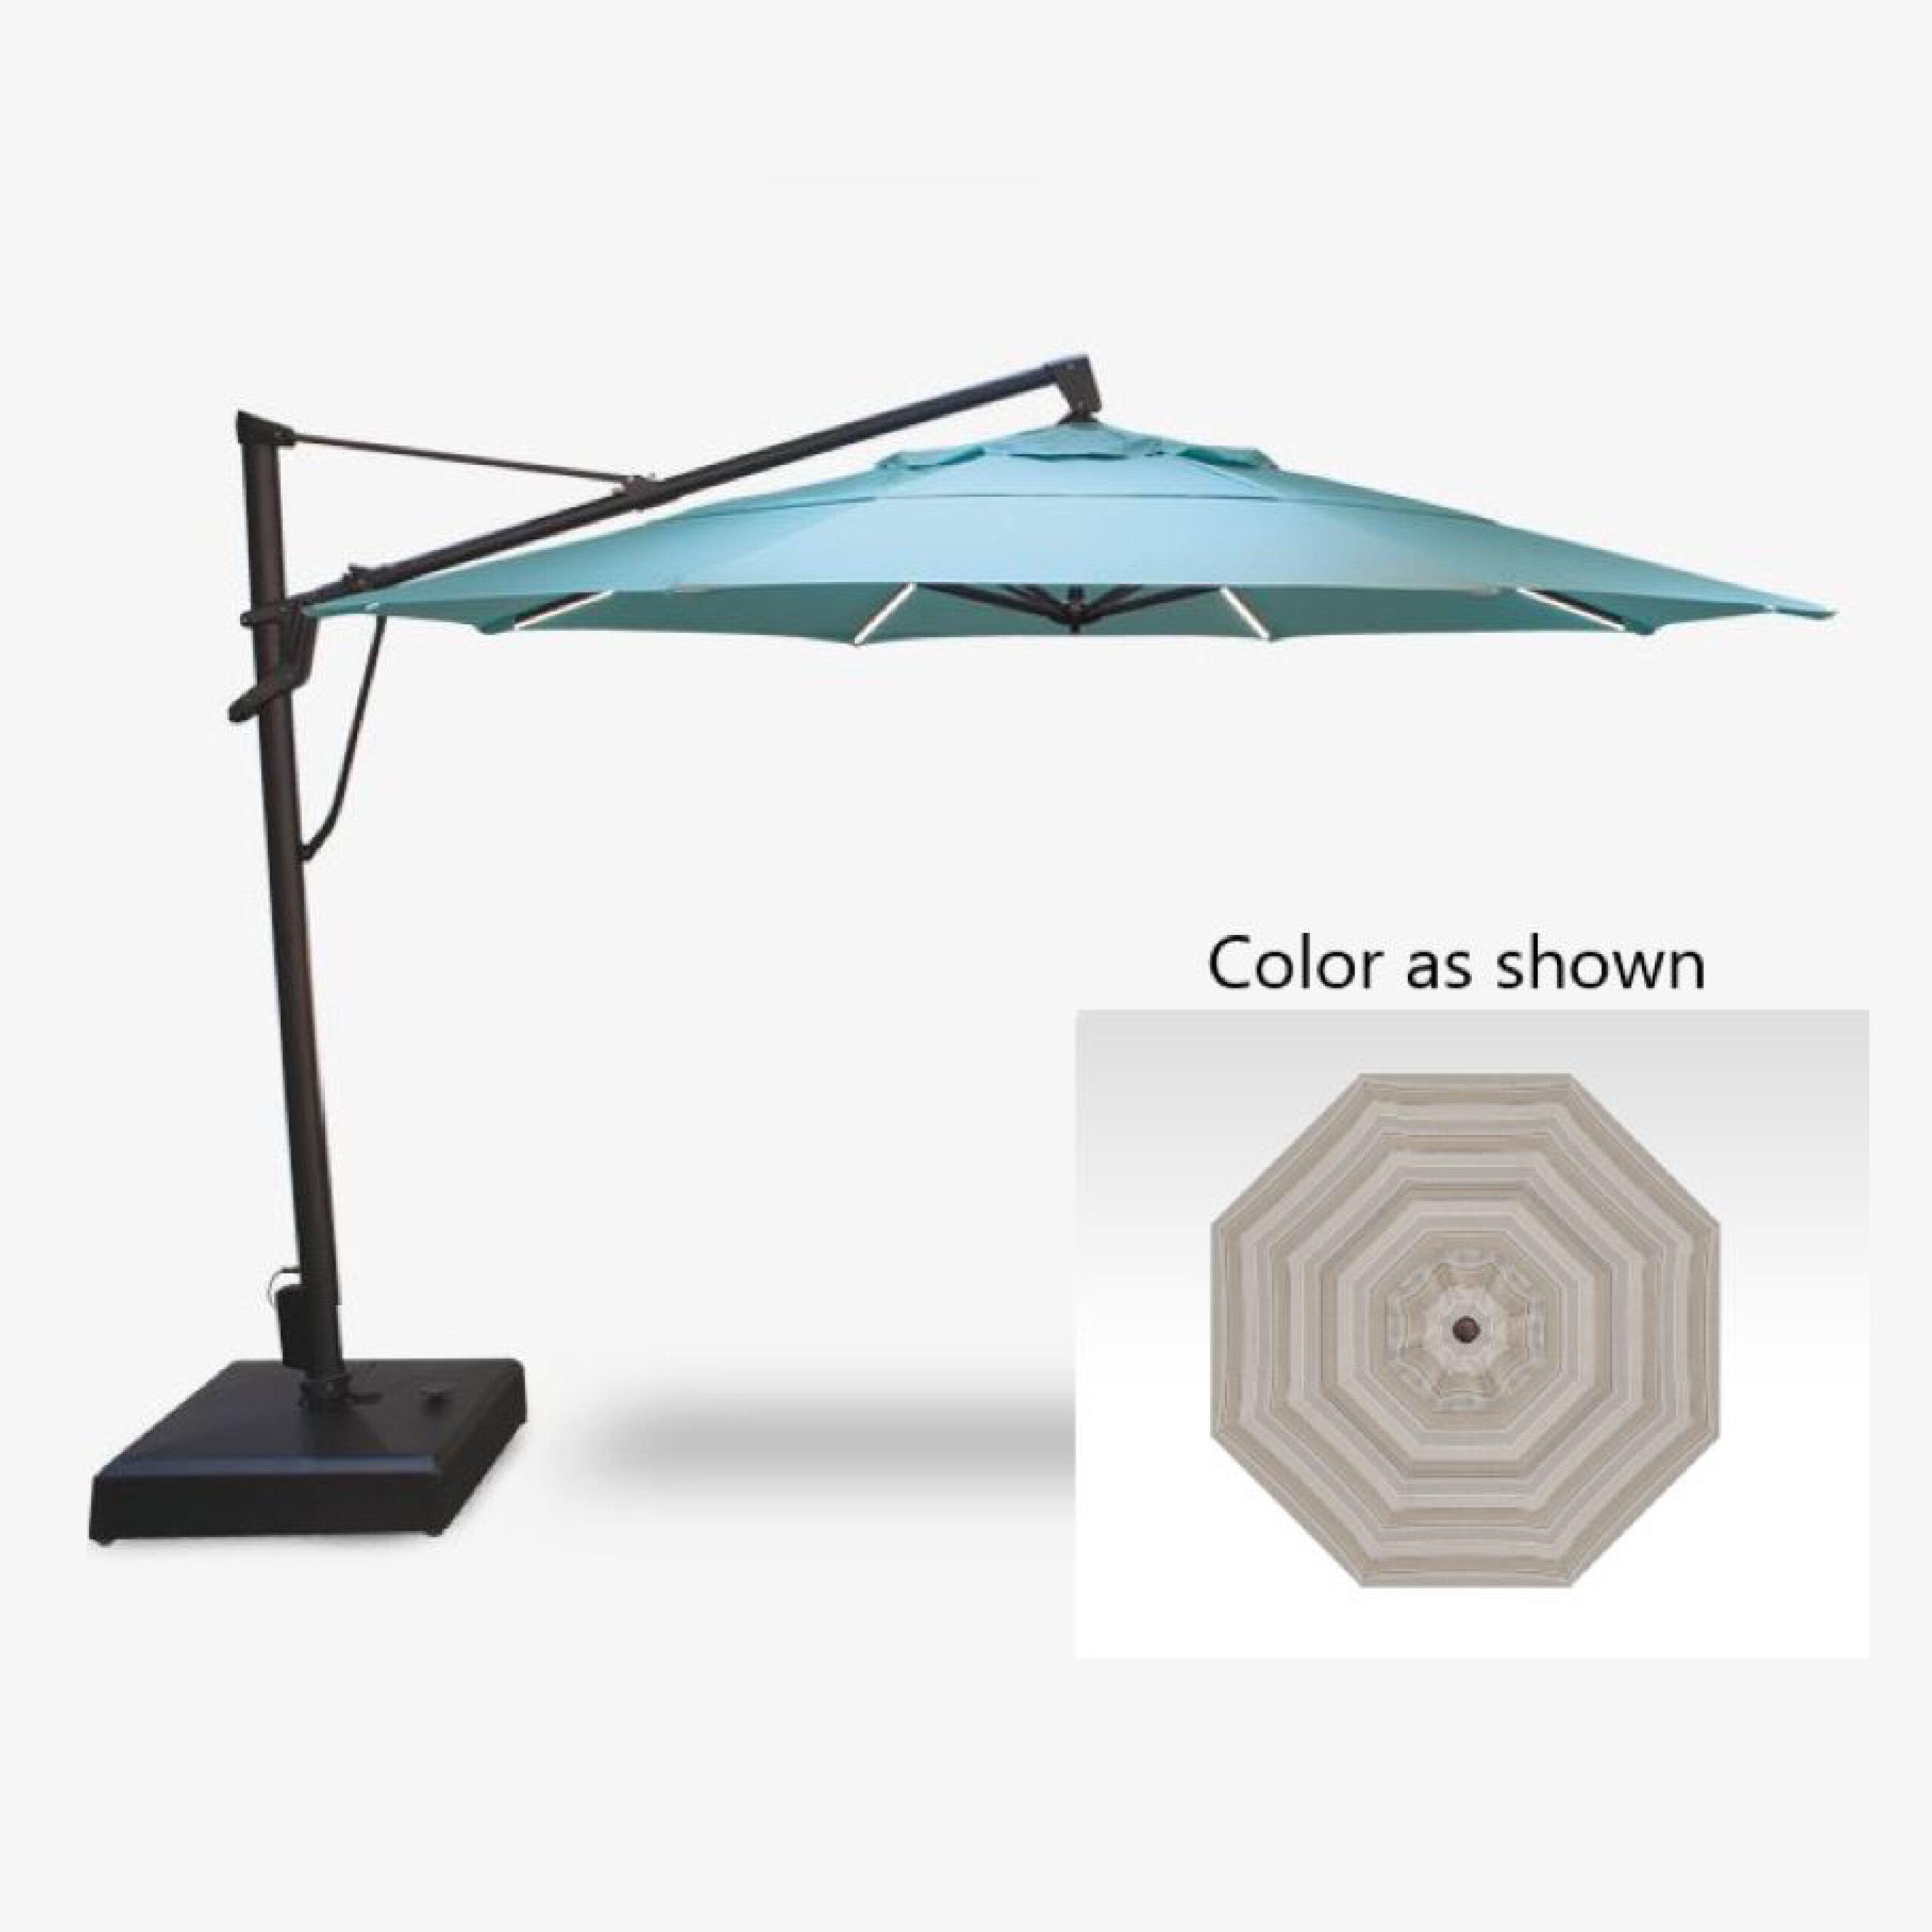 treasure garden starlux akzp 13 plus 13 foot cantilever umbrella